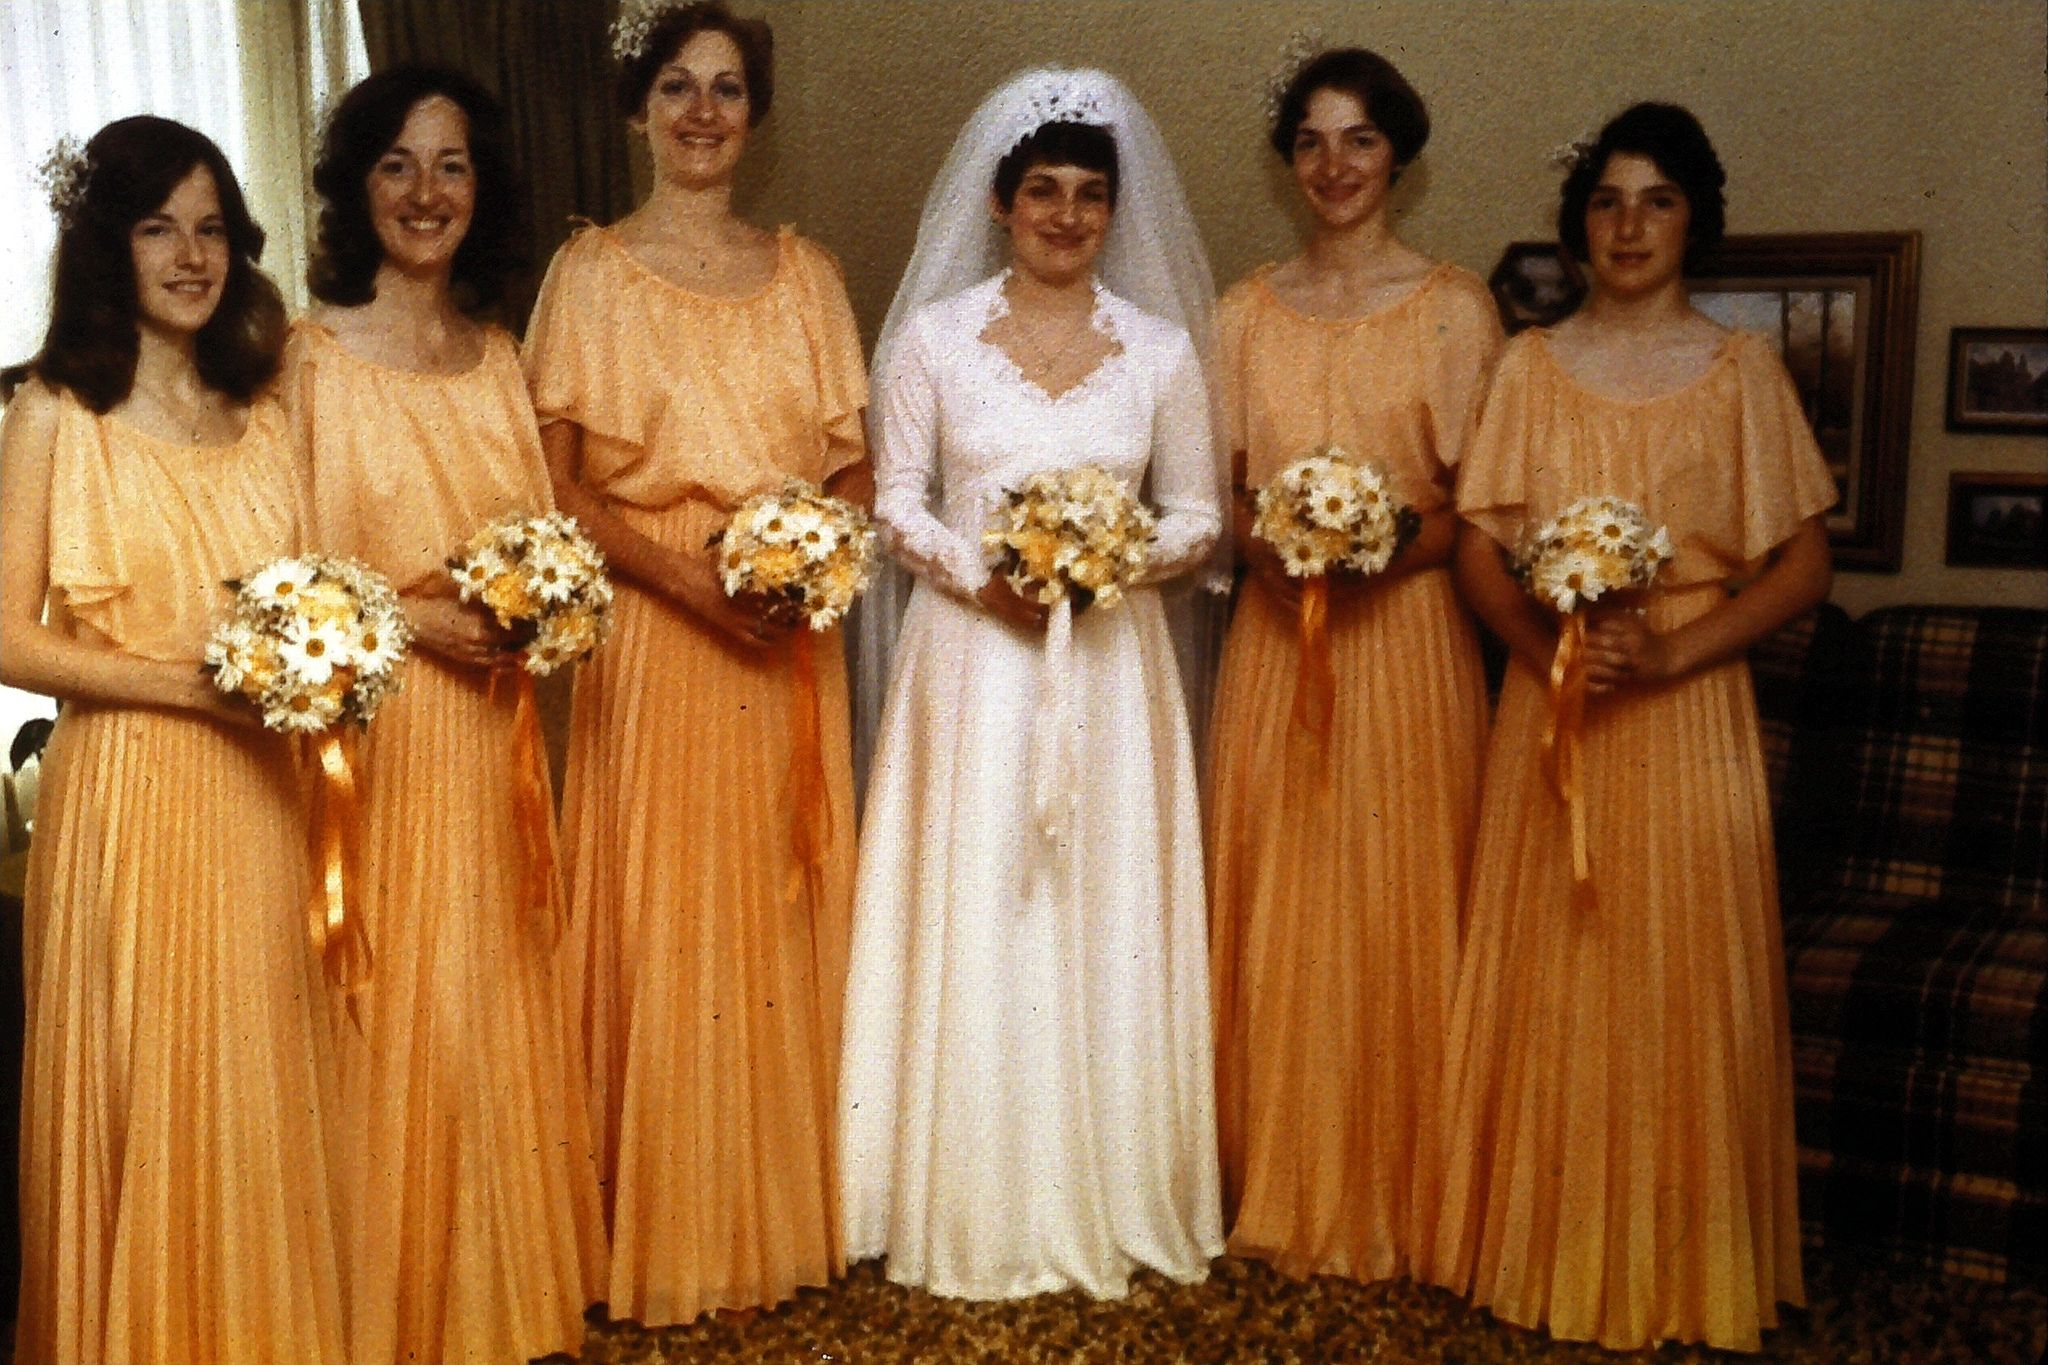 Ed and andreaus wedding wedding board i said i wouldnt